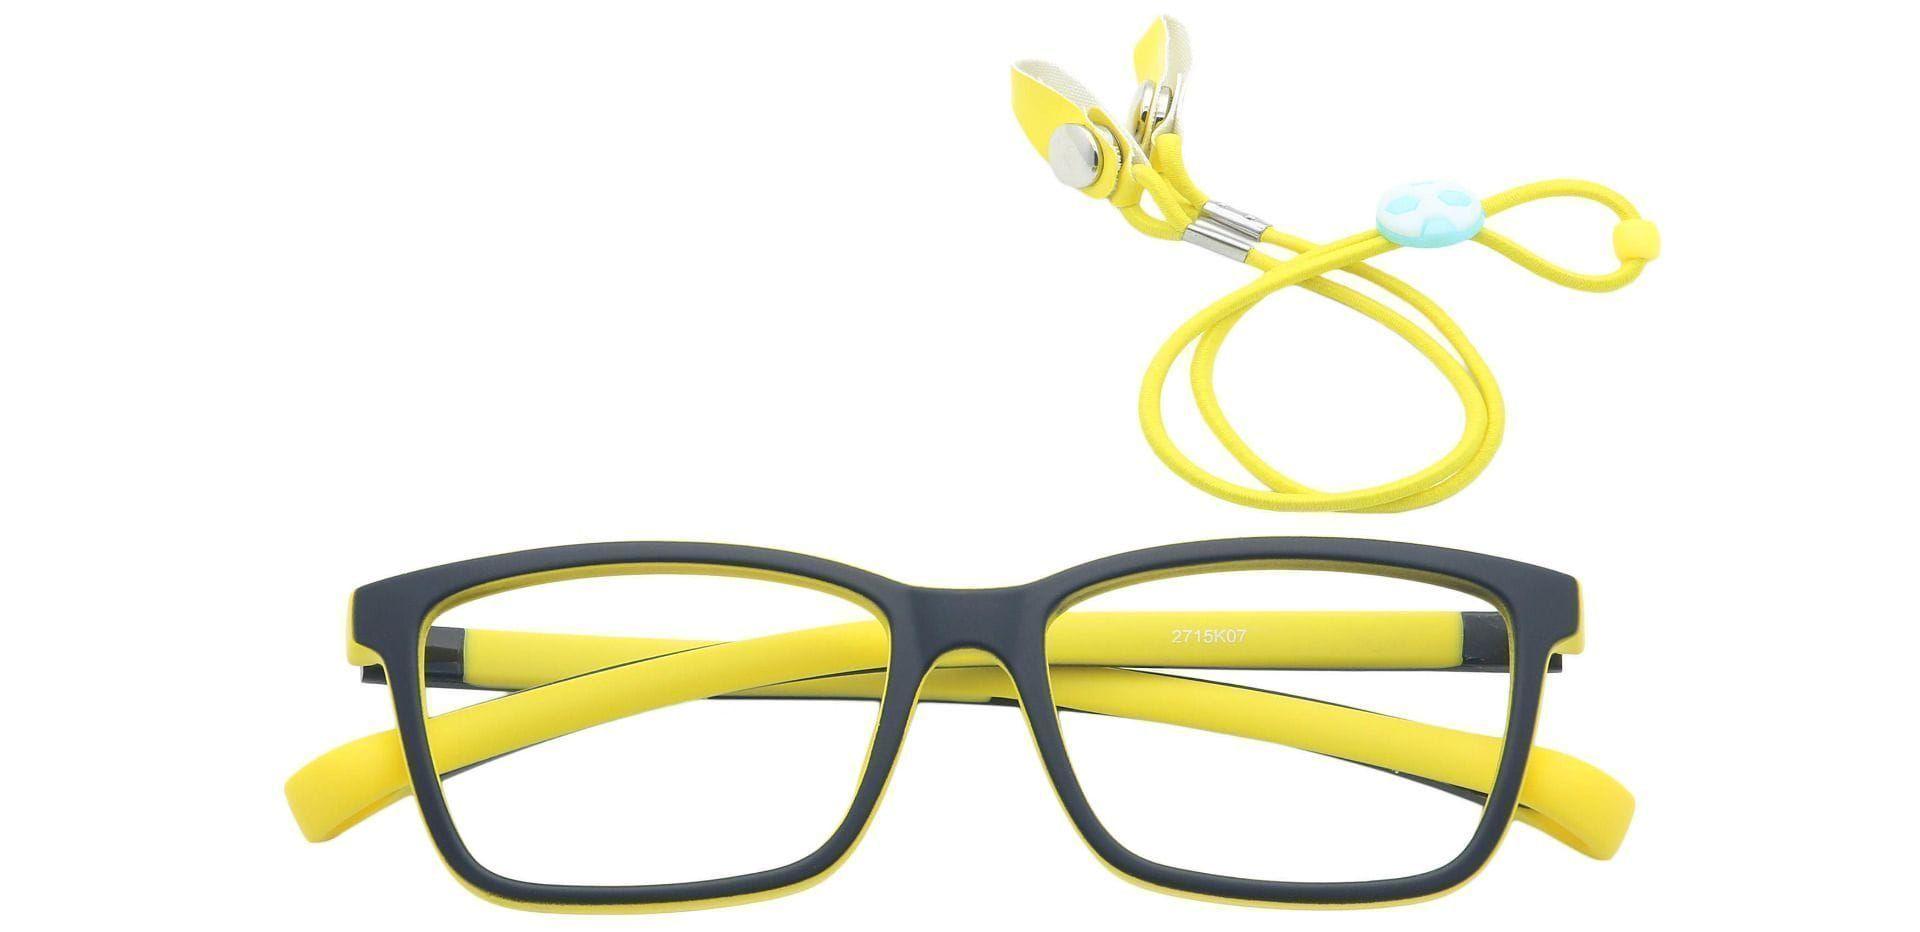 Misty Rectangle Non-Rx Glasses - Black